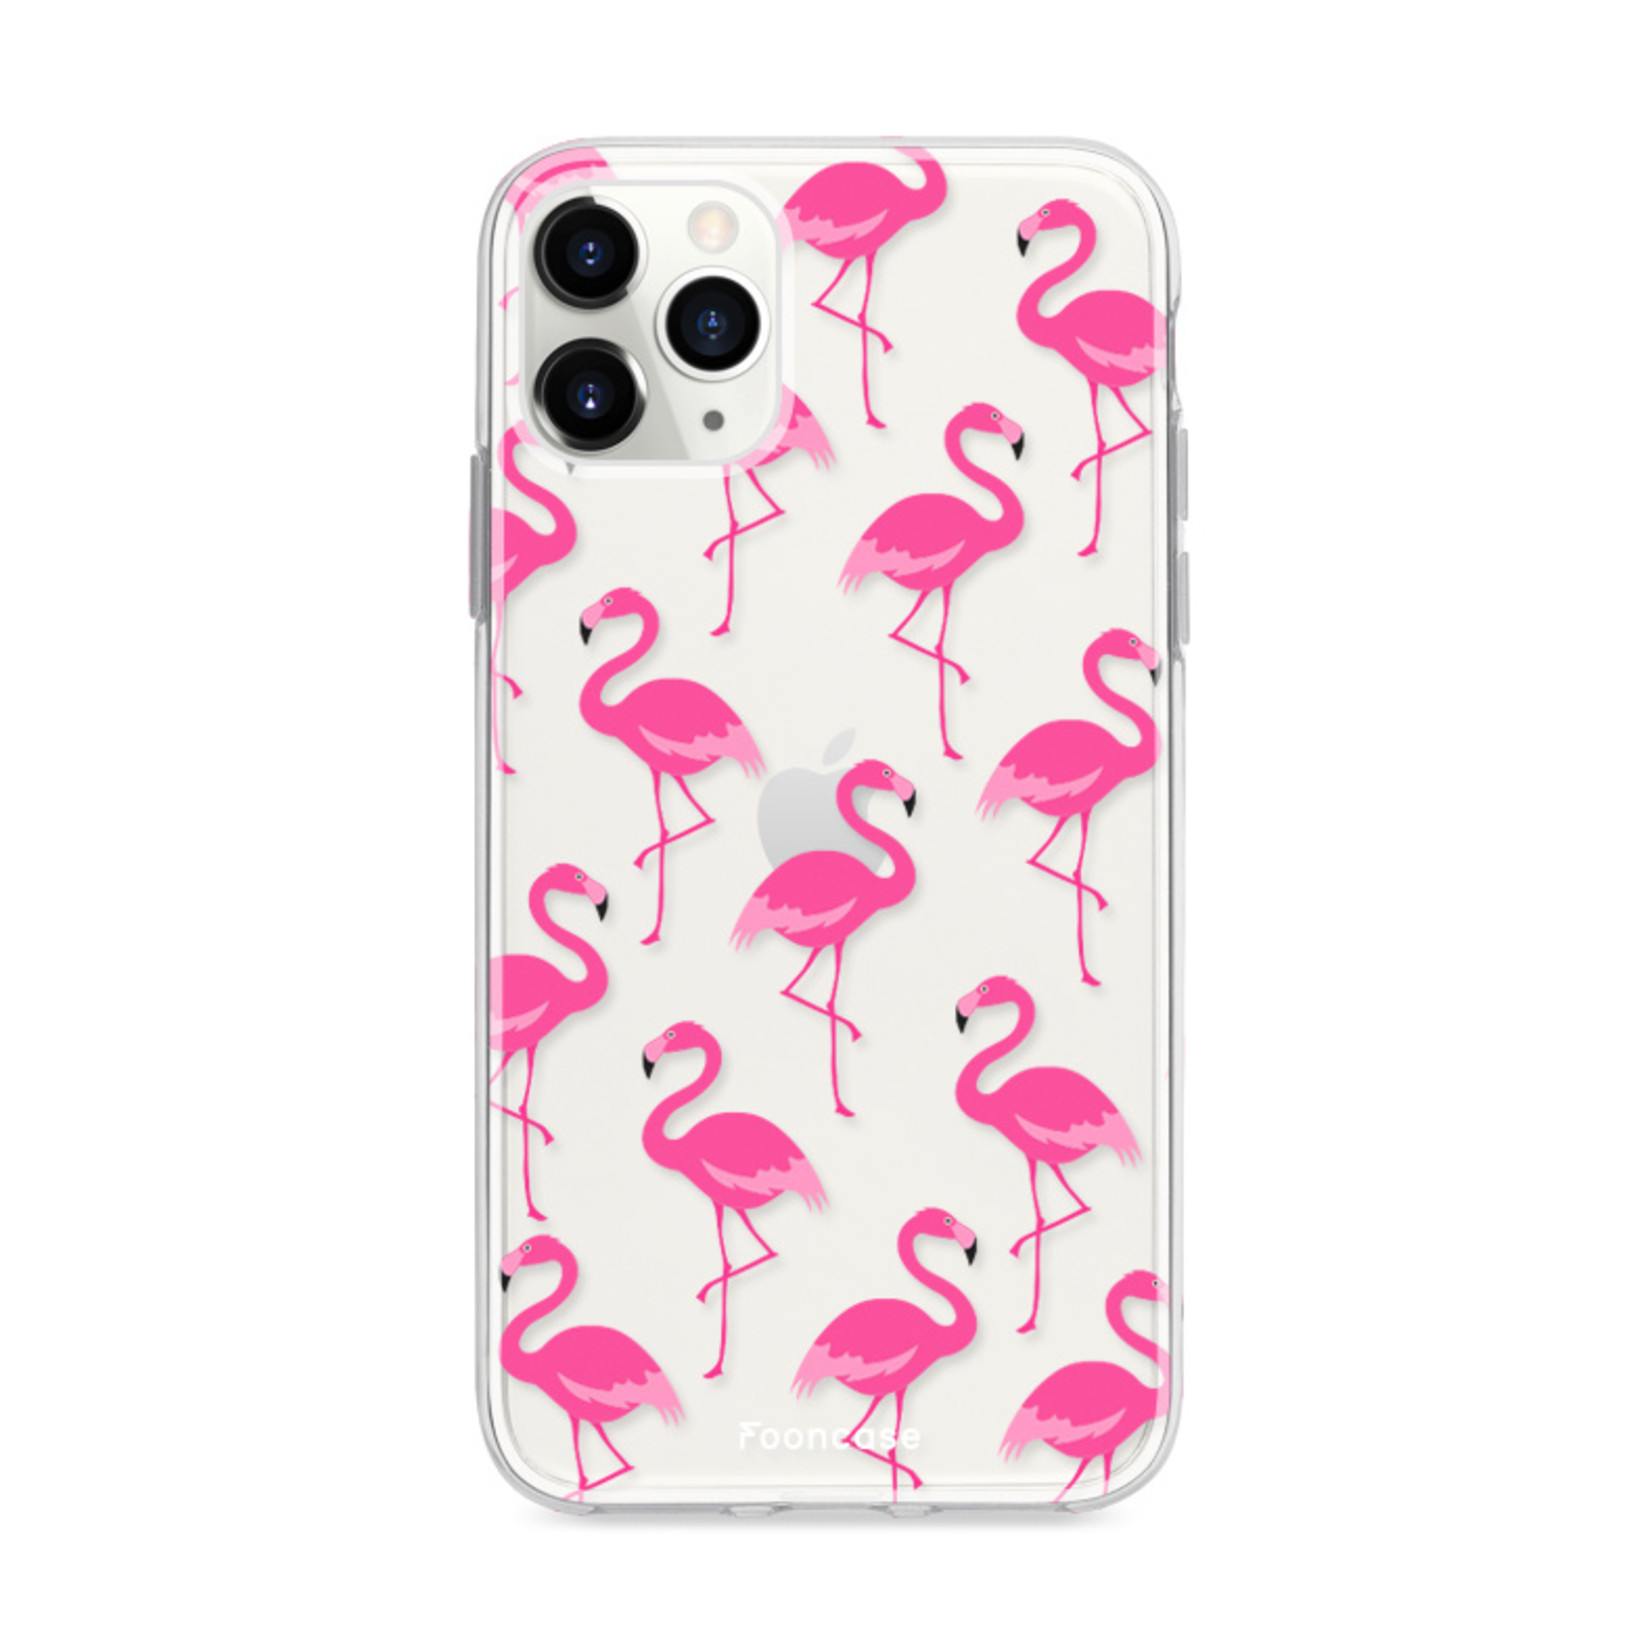 FOONCASE IPhone 11 Pro Handyhülle - Flamingo